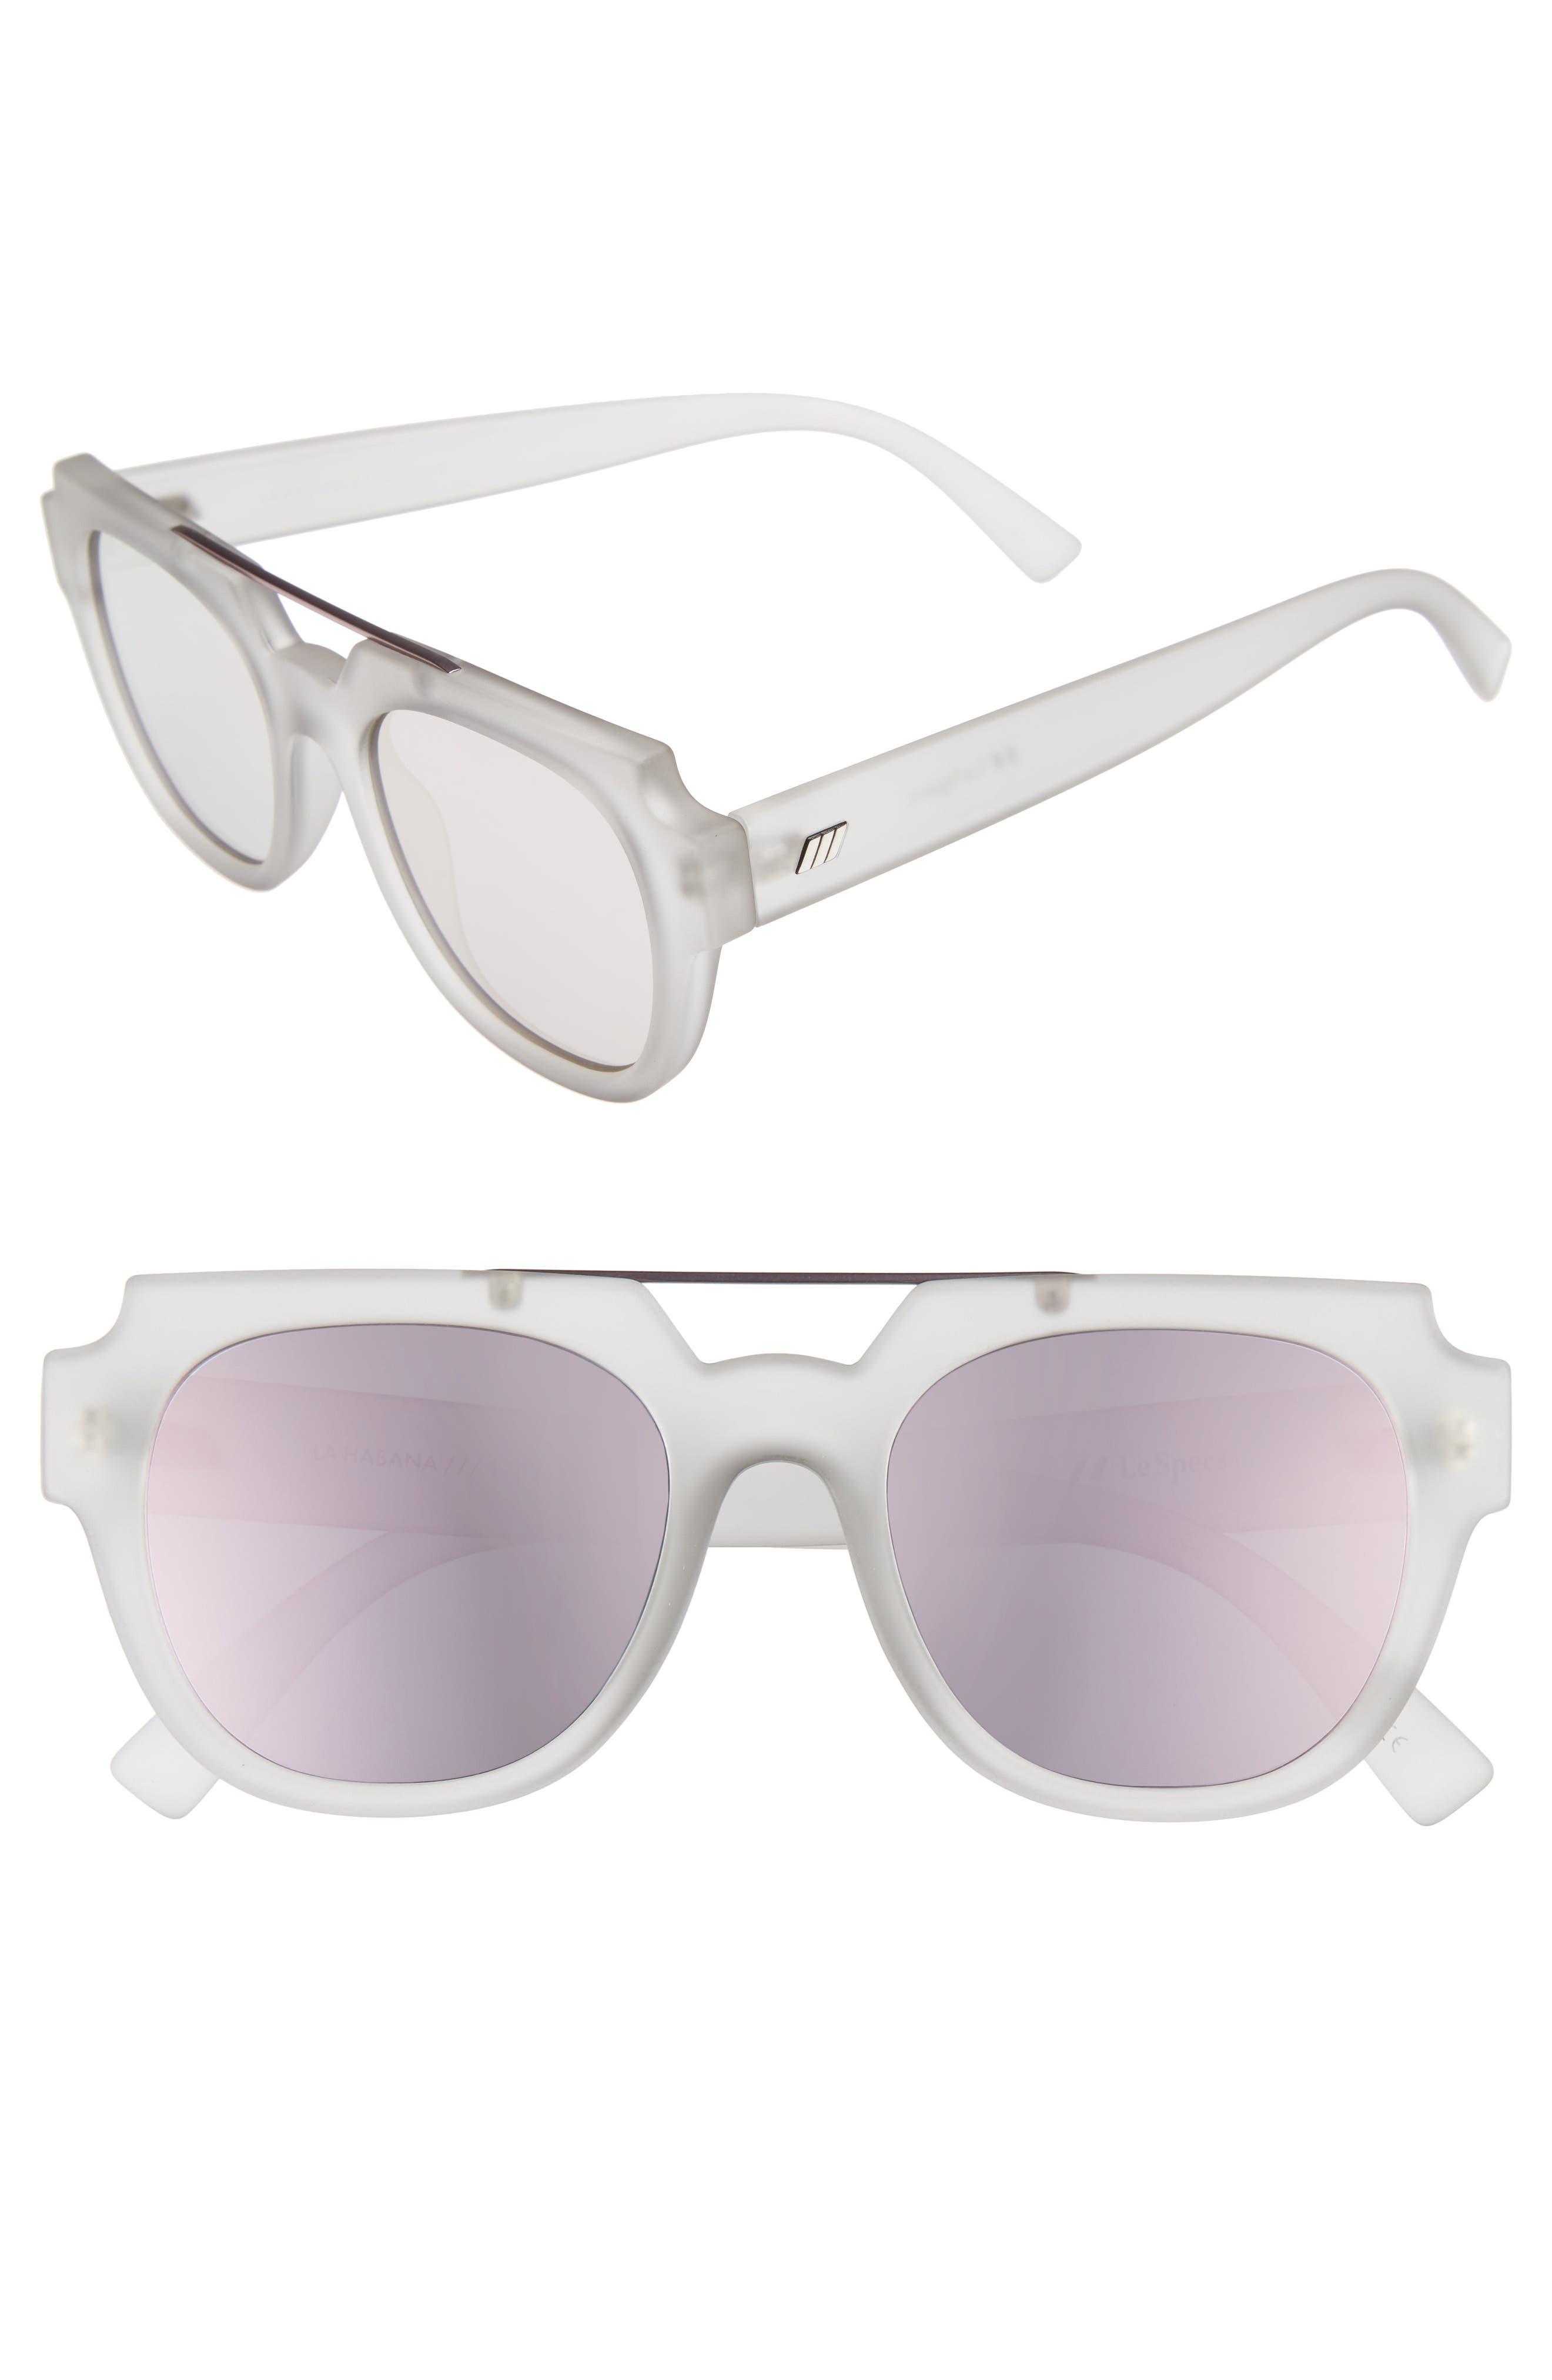 Main Image - Le Specs La Habana 52mm Retro Sunglasses